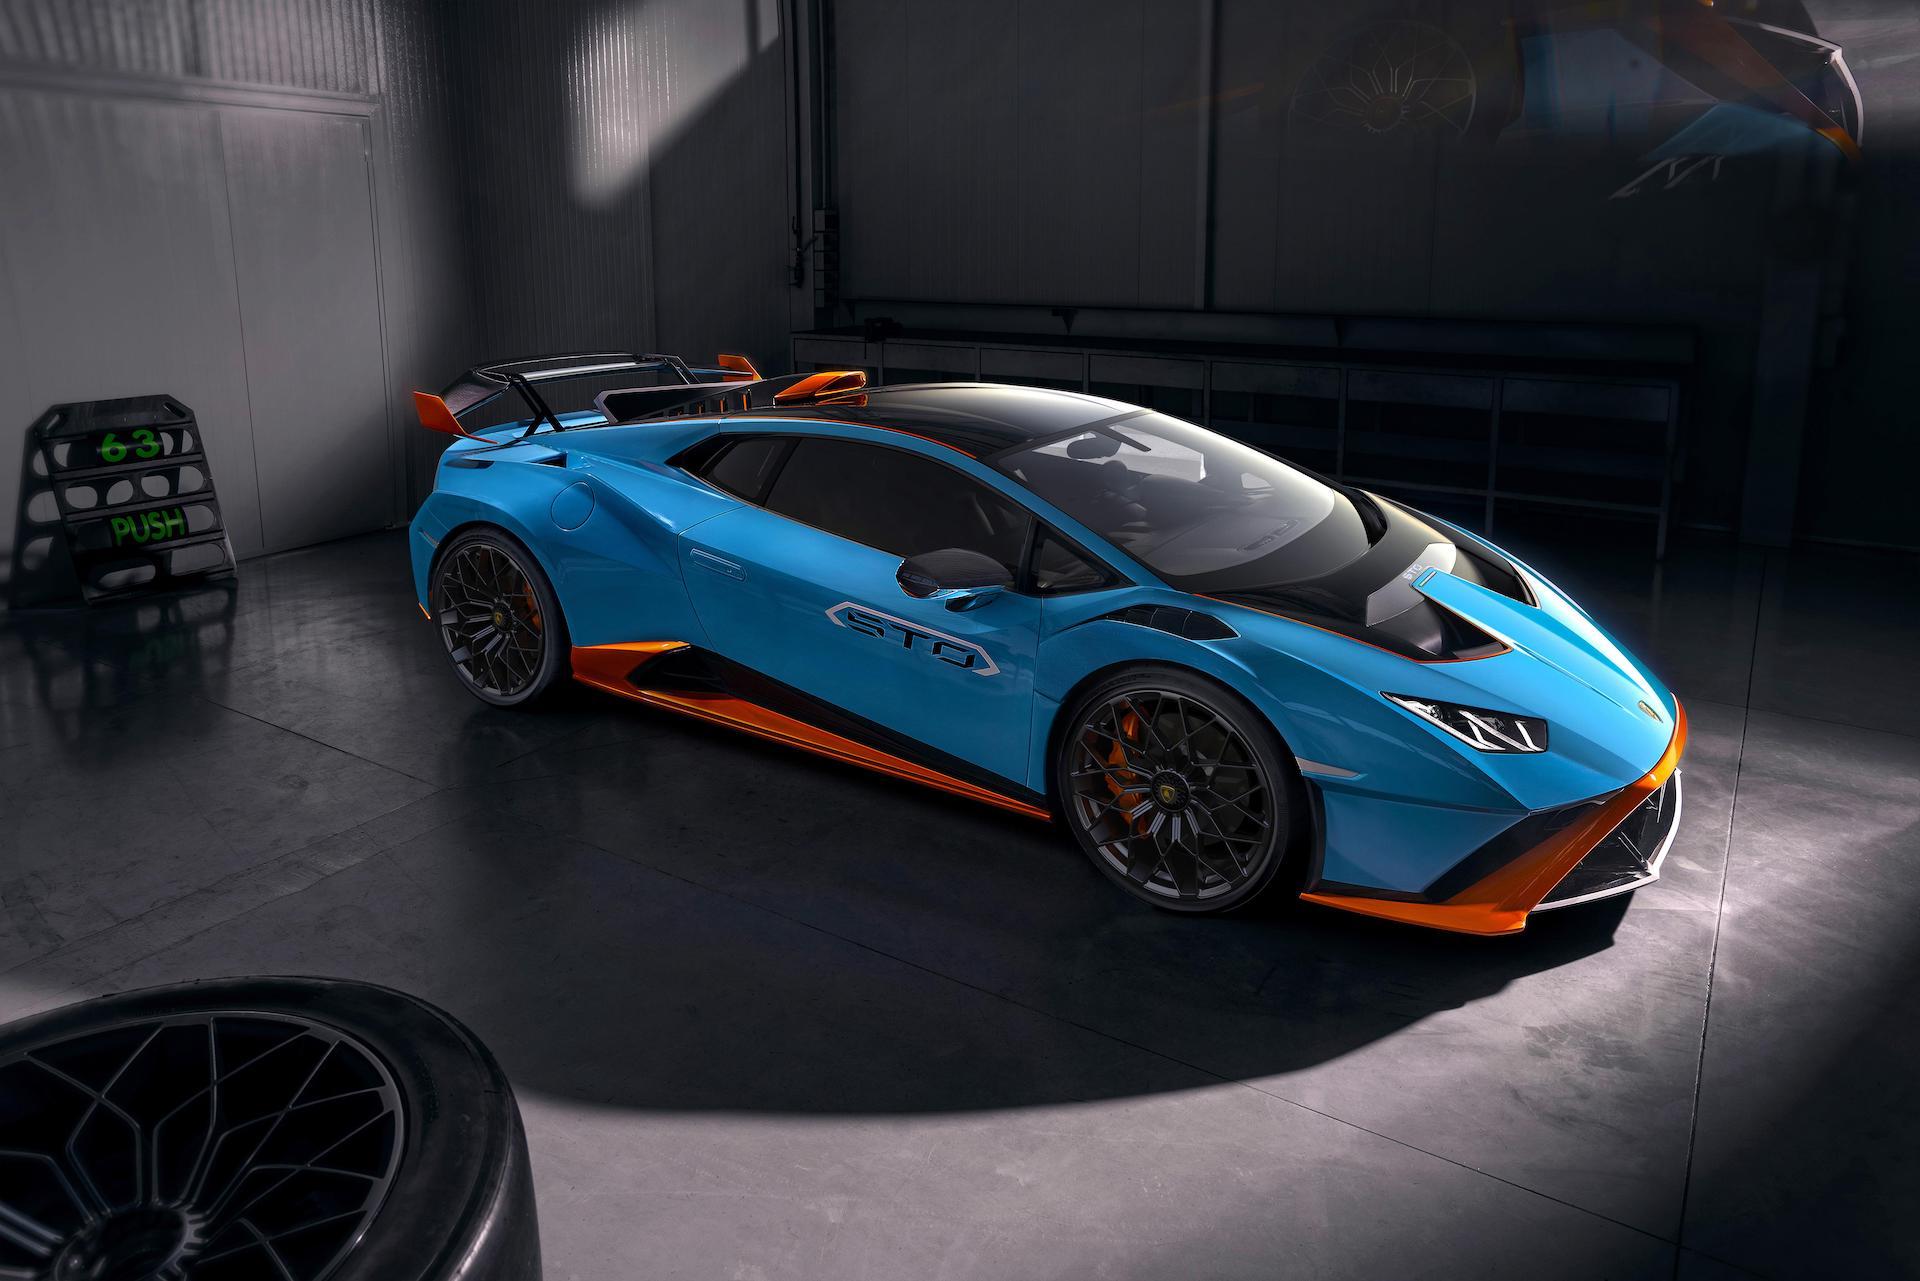 Der neue Lamborghini STO: Die Inkarnation des Squadra Corse-Erbes 4